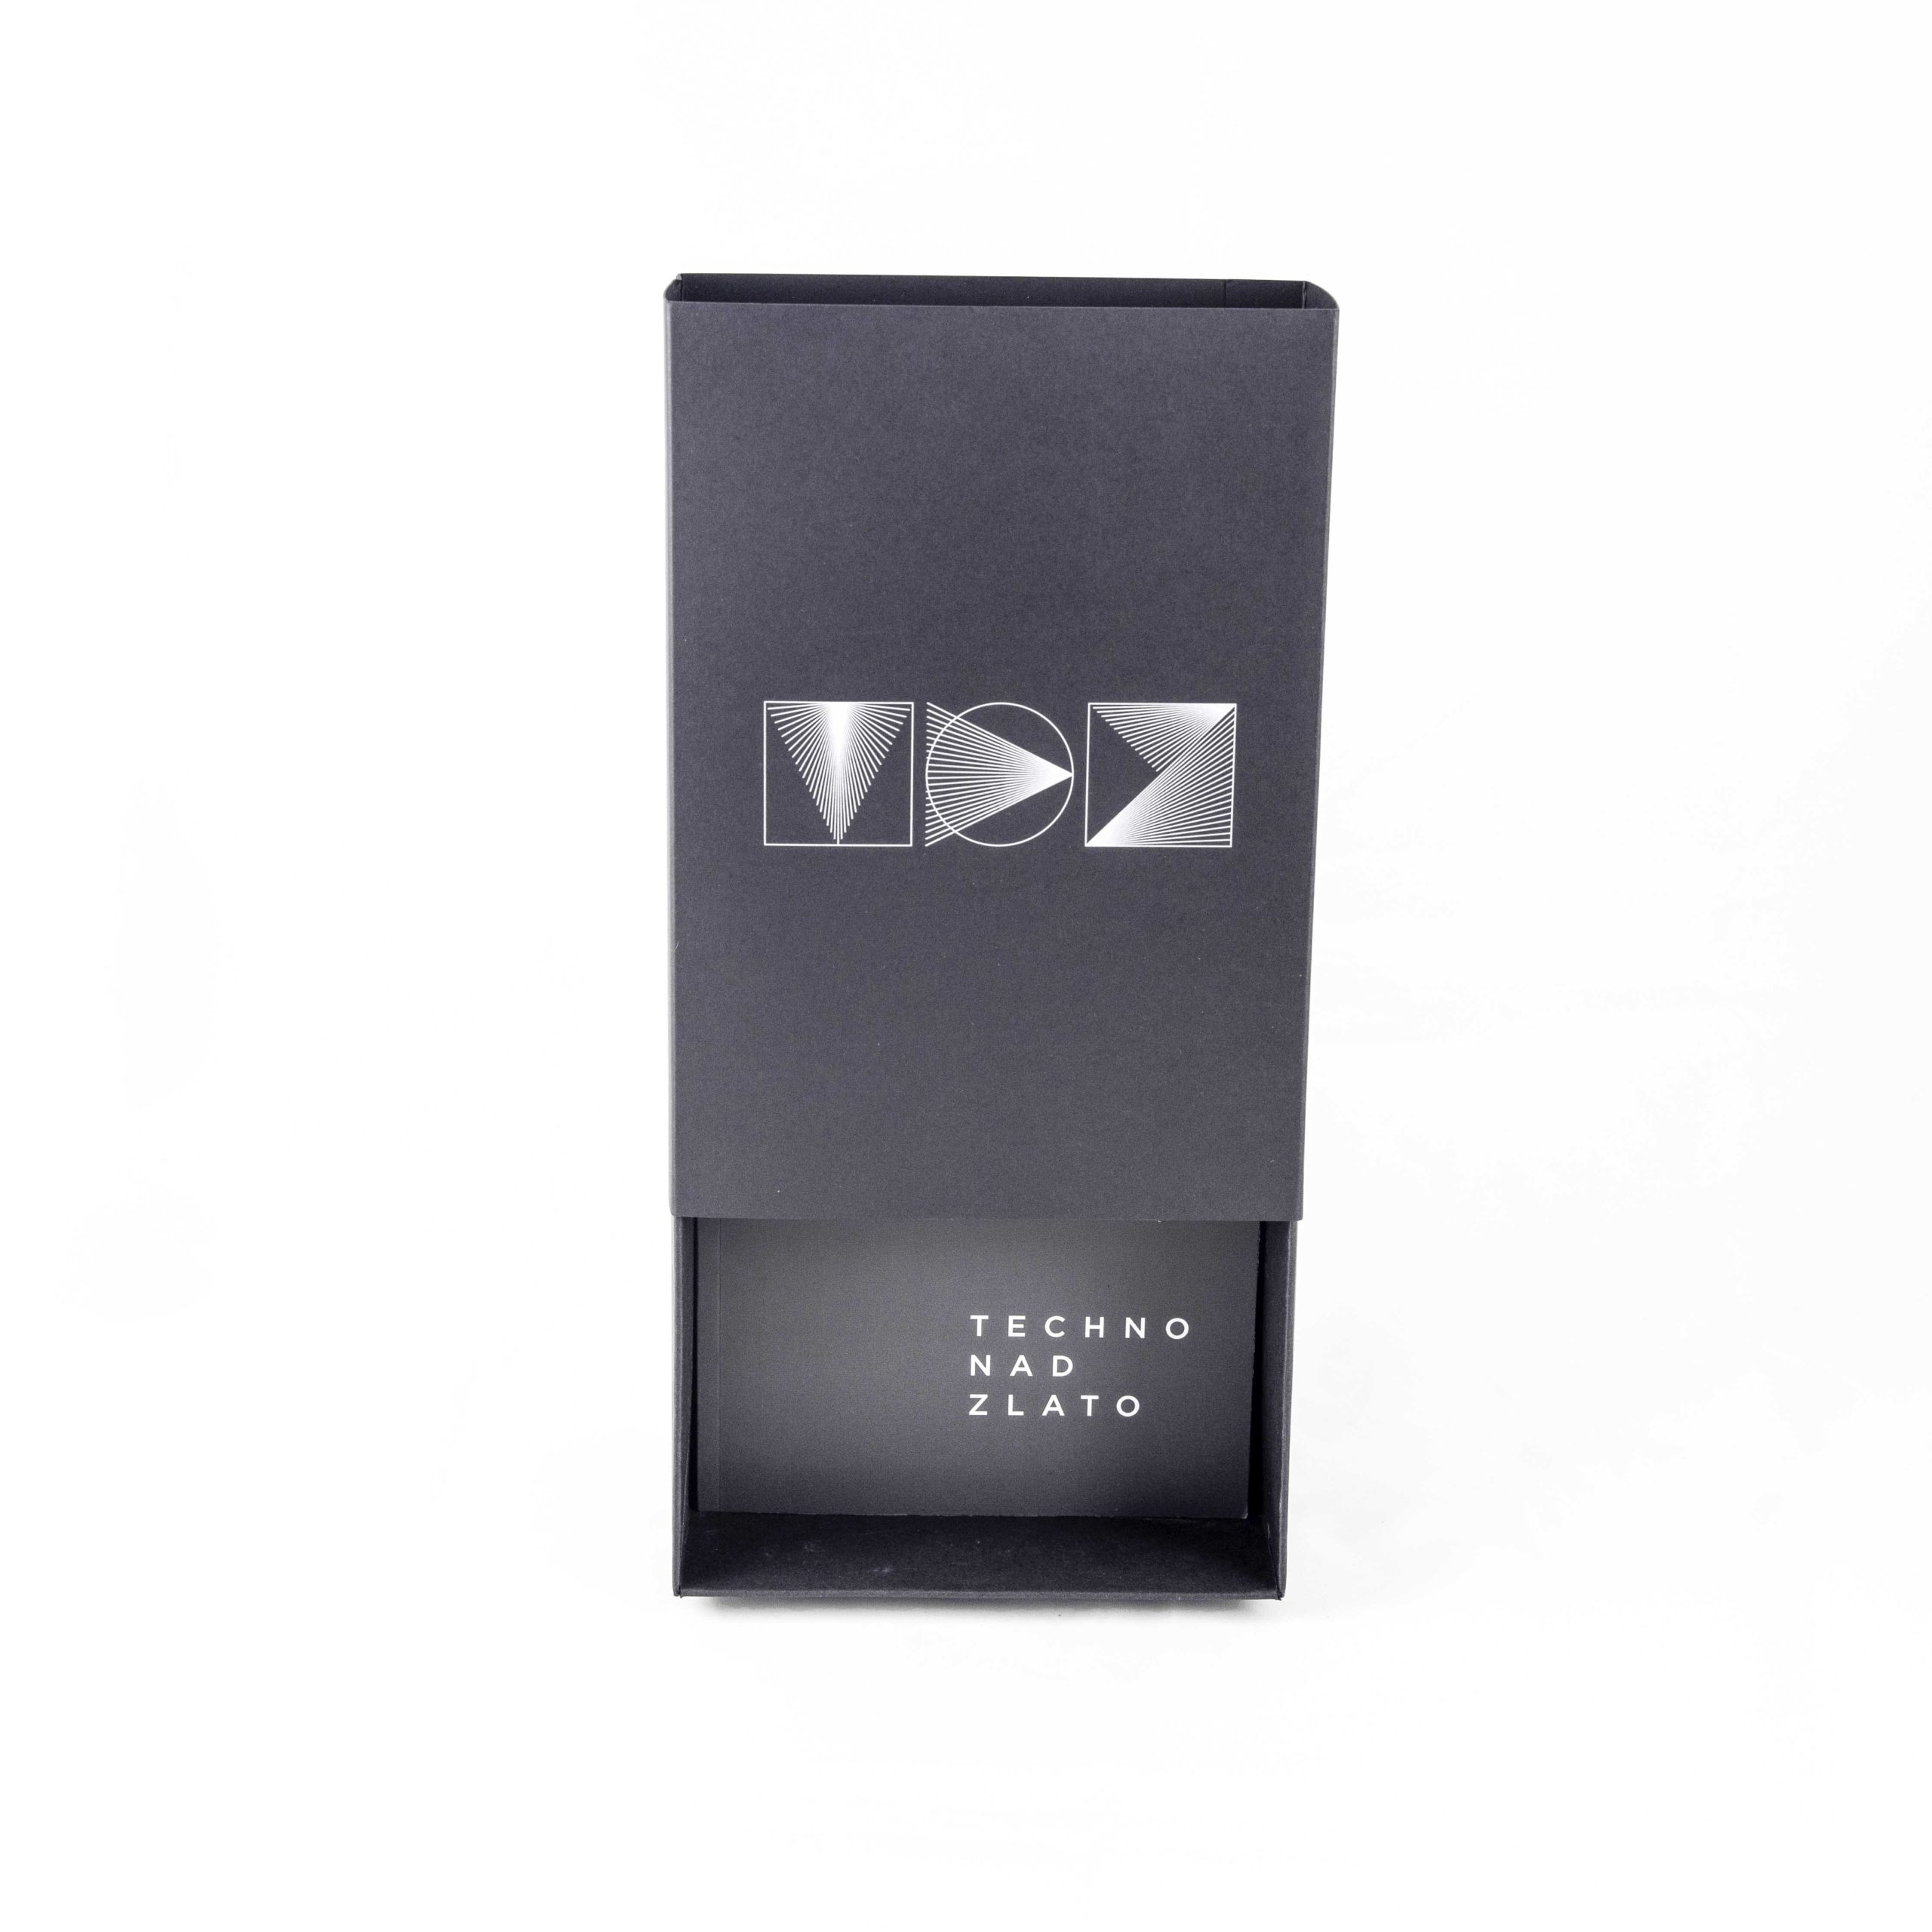 RM kniha detail + krabica7